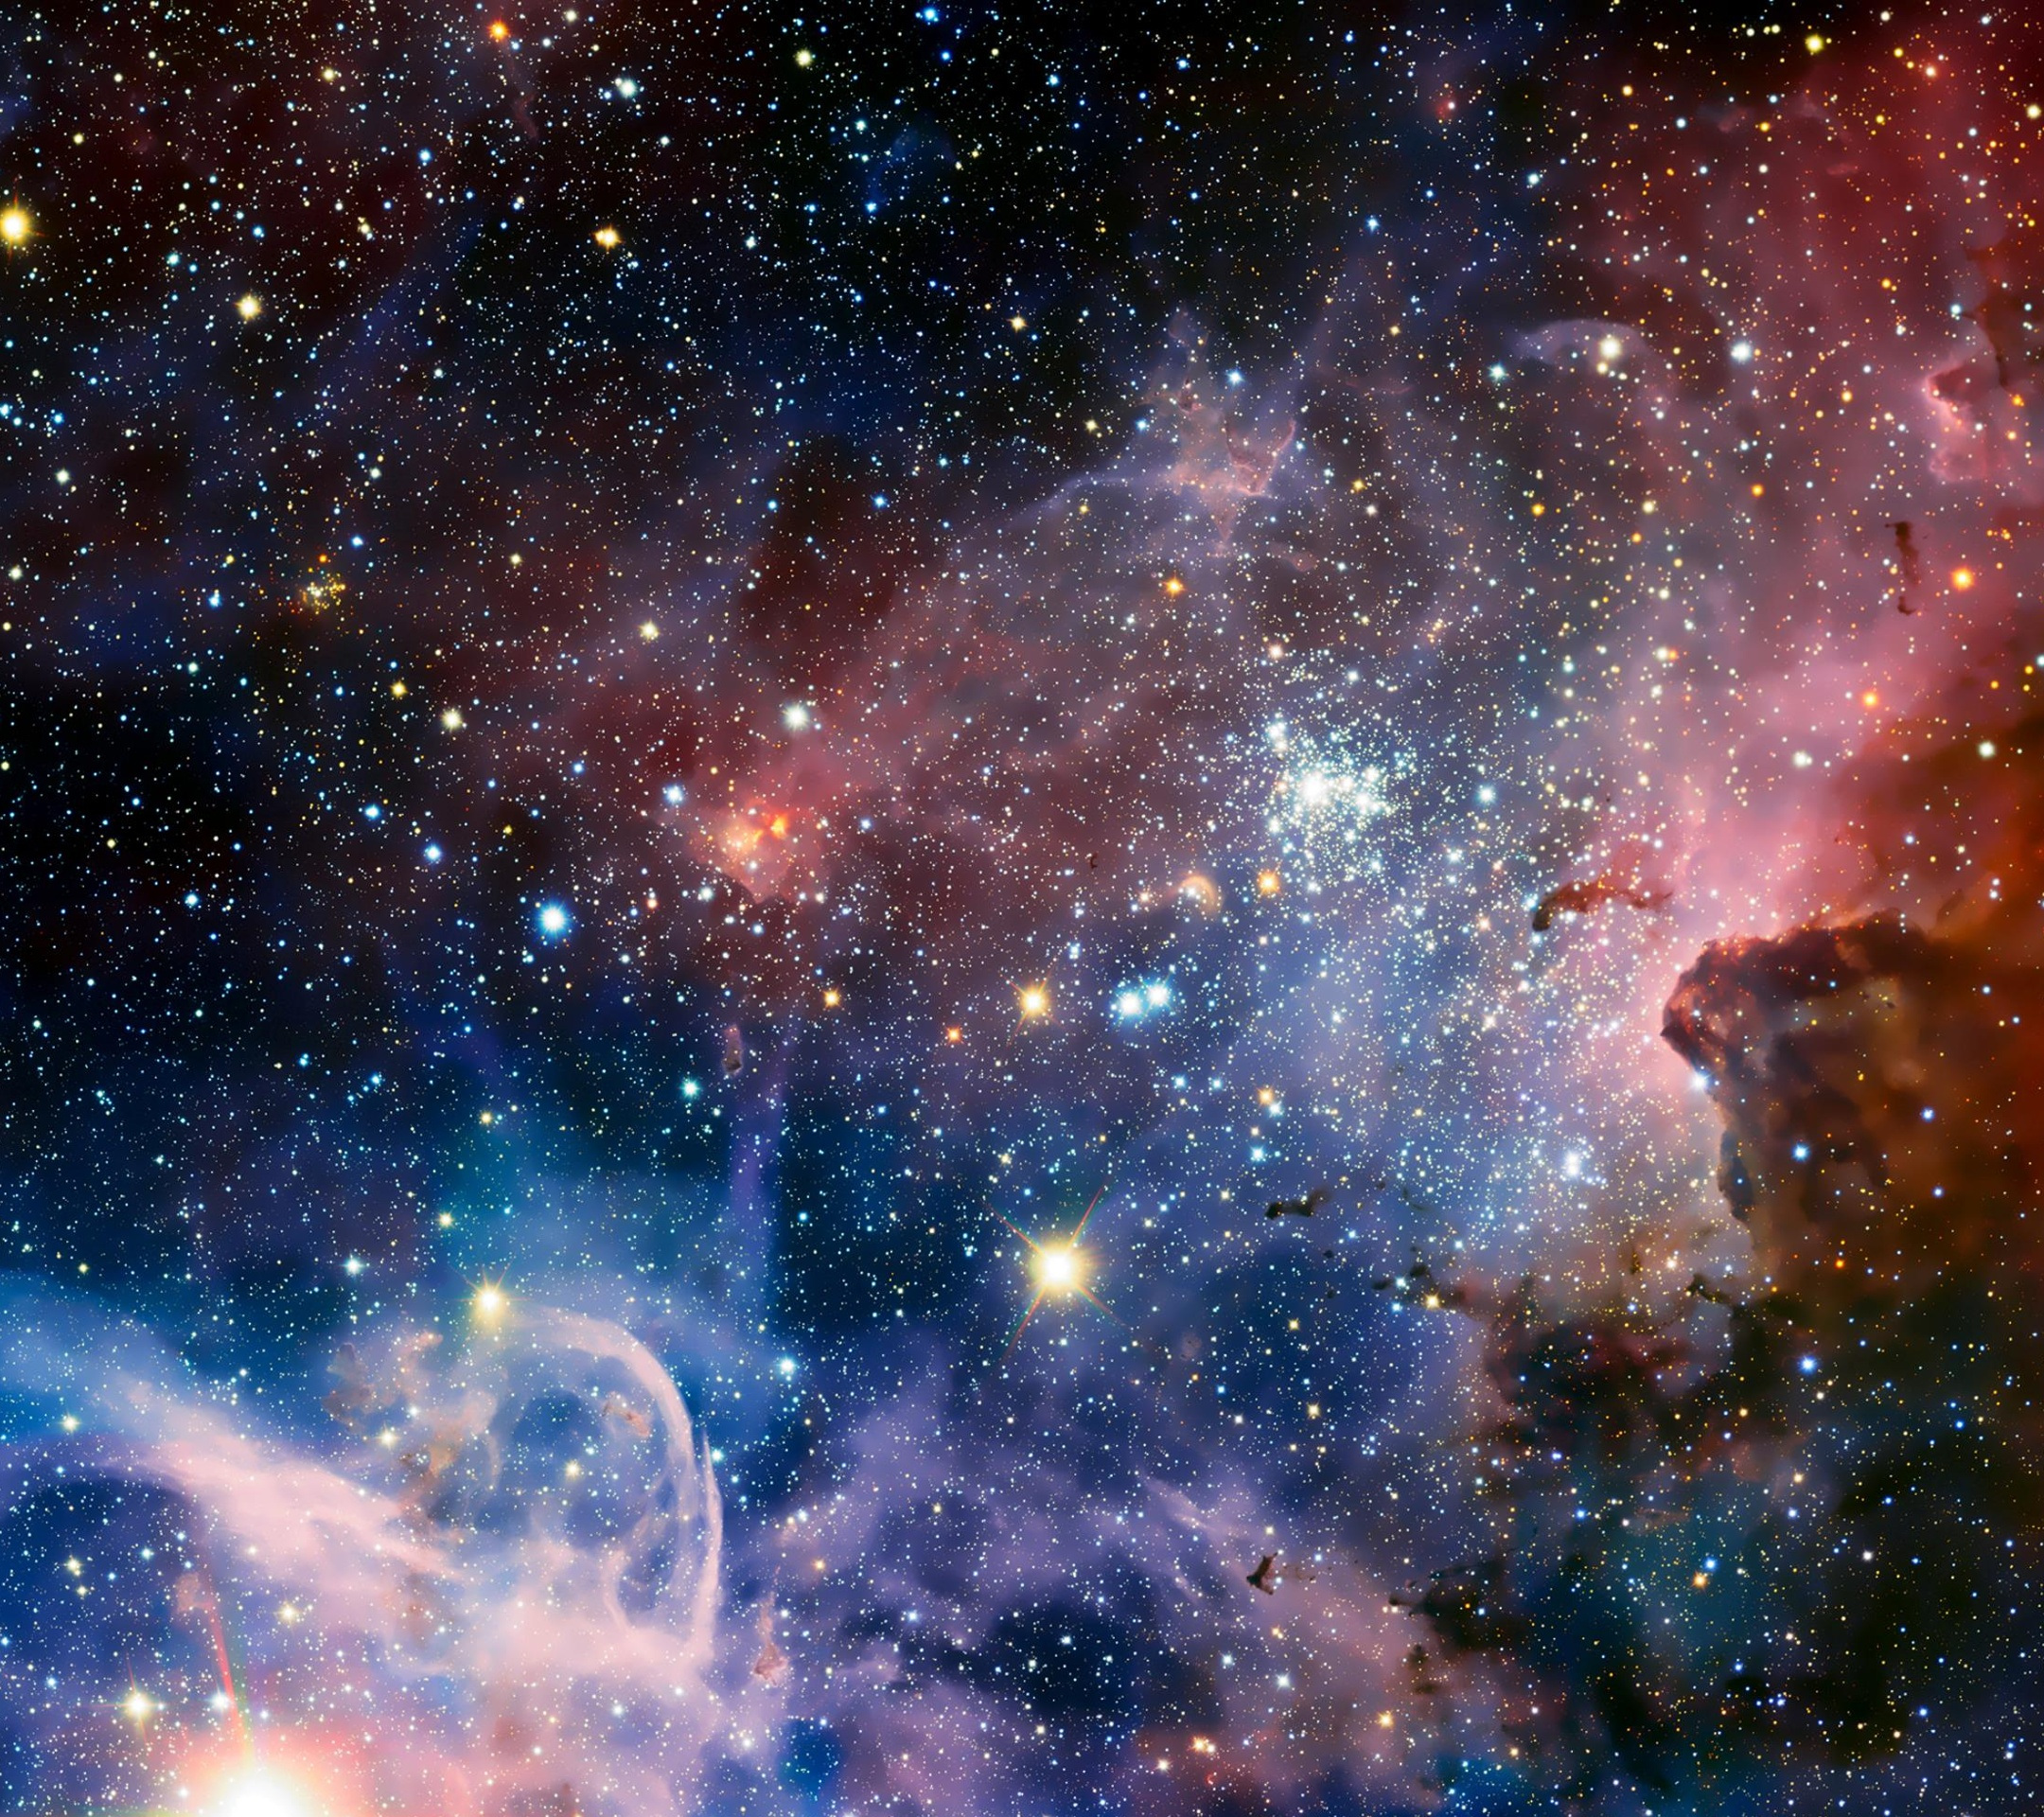 Nebula-HD-Wallpaper-Samsung-Galaxy-S5-HD-Wallpapers-Free